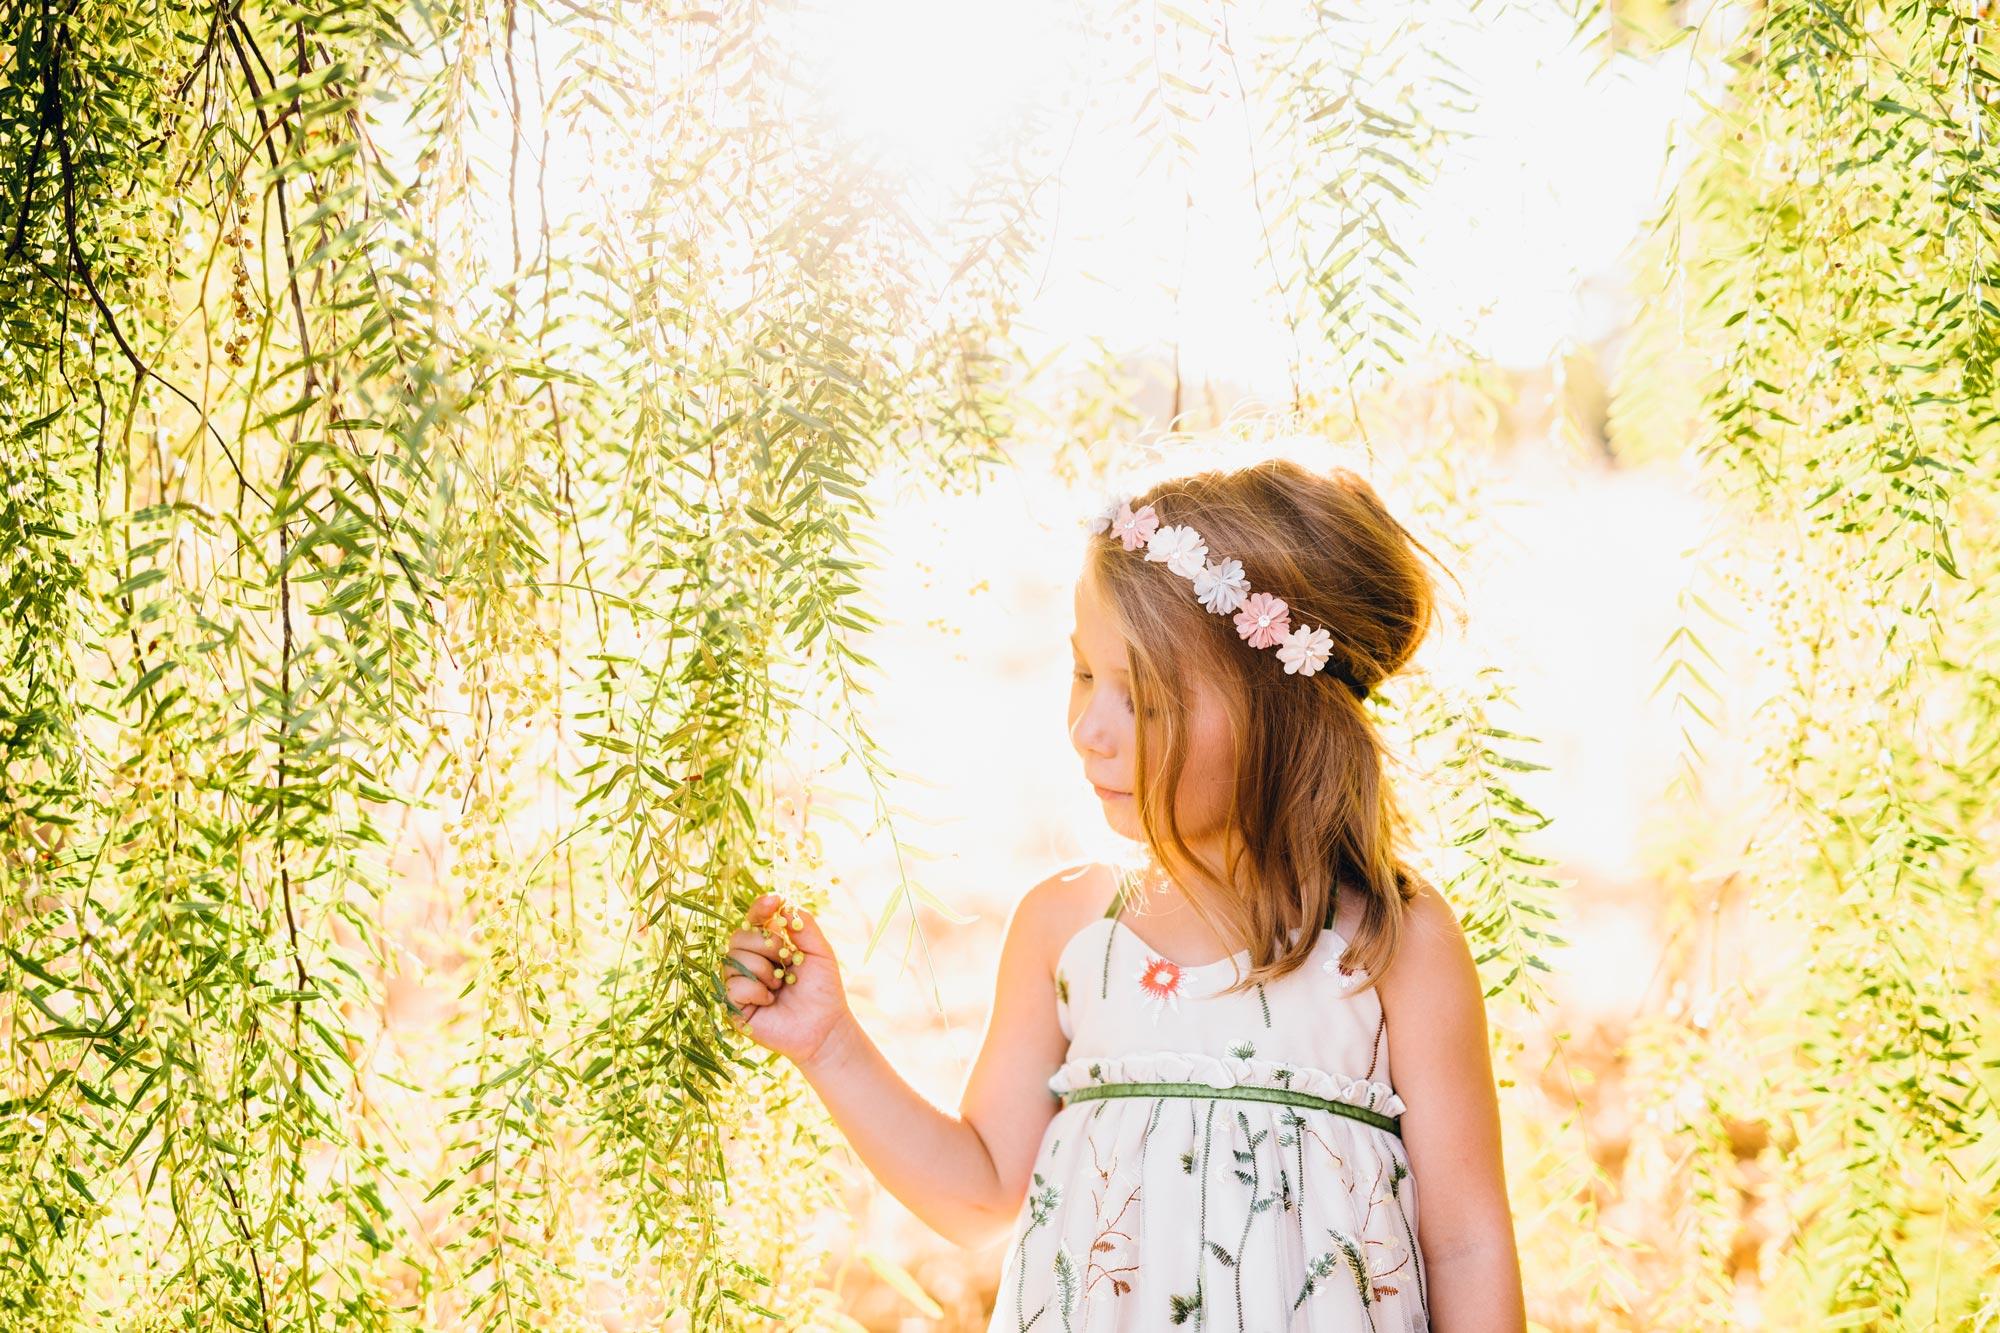 willow-tree-girl-portrait-walnut-creek.jpg